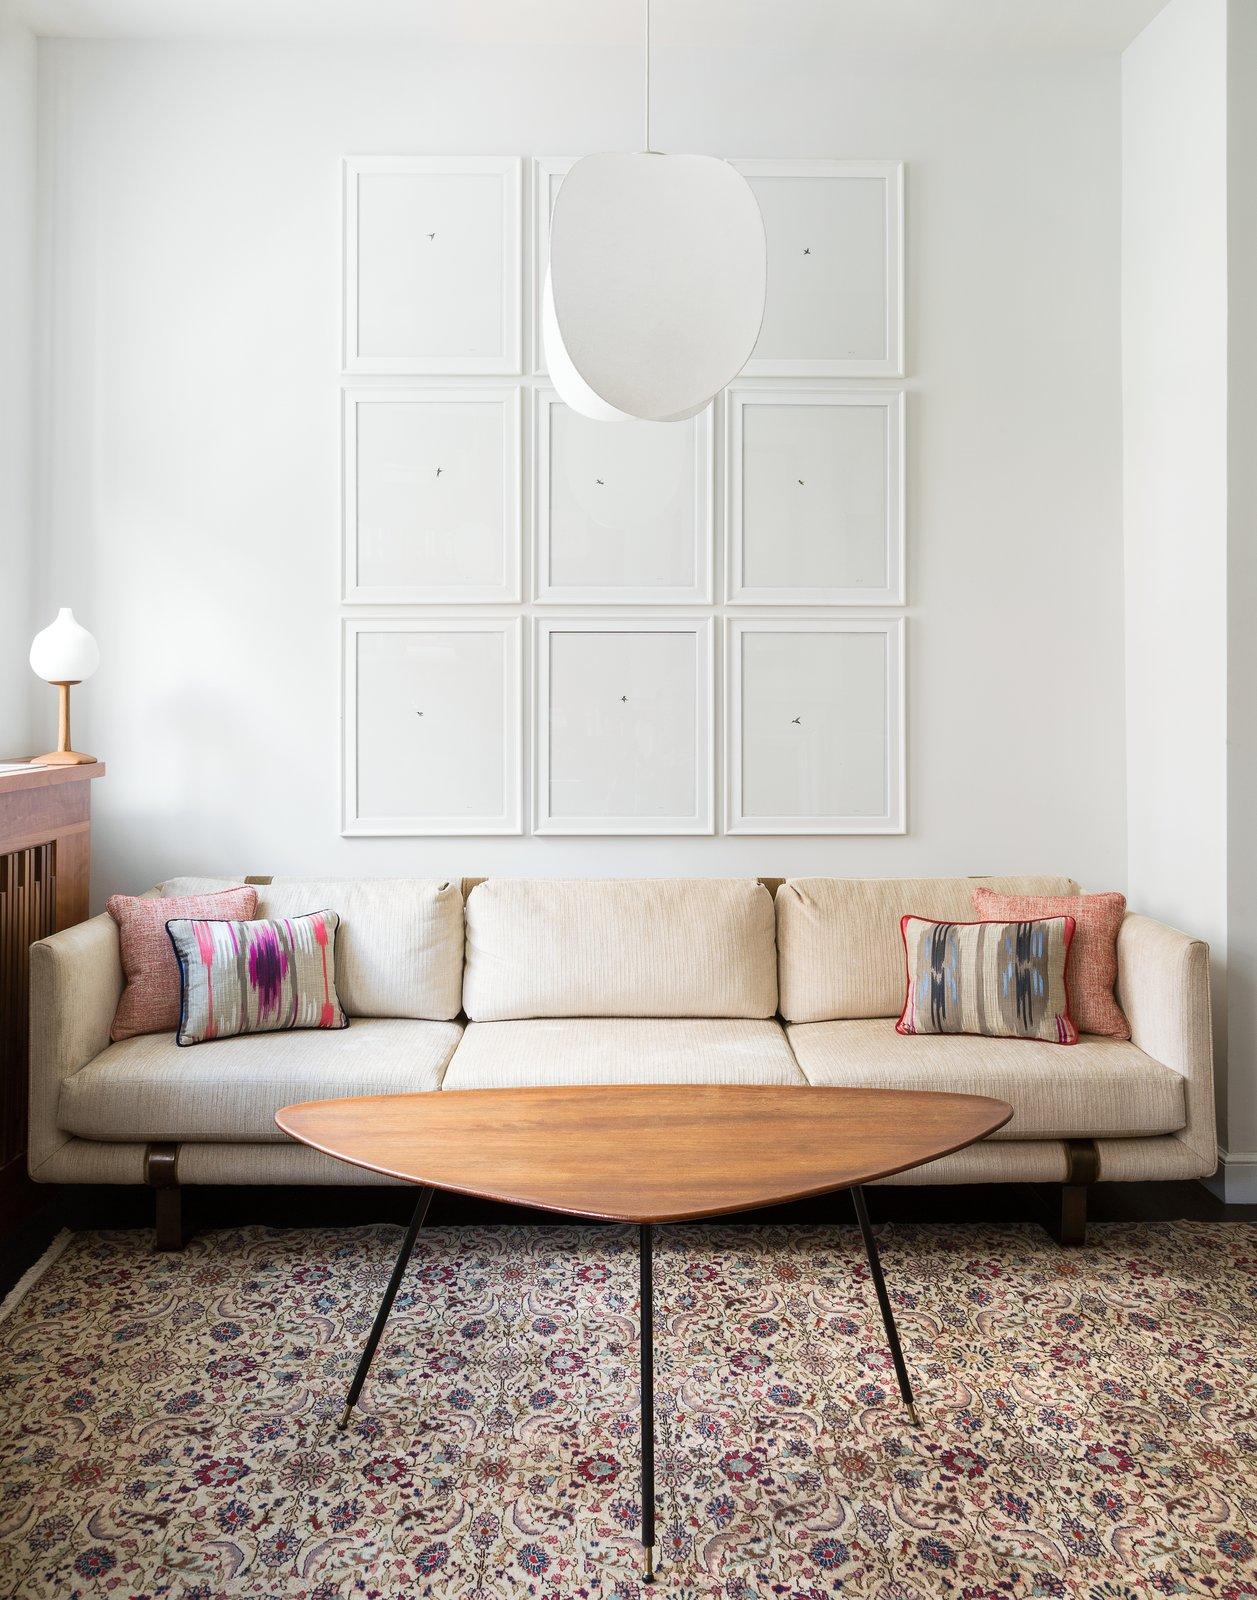 Cutaway Apartment Full Furnitures Modern Design: 725 Square Feet And Loads Of Modern Gems